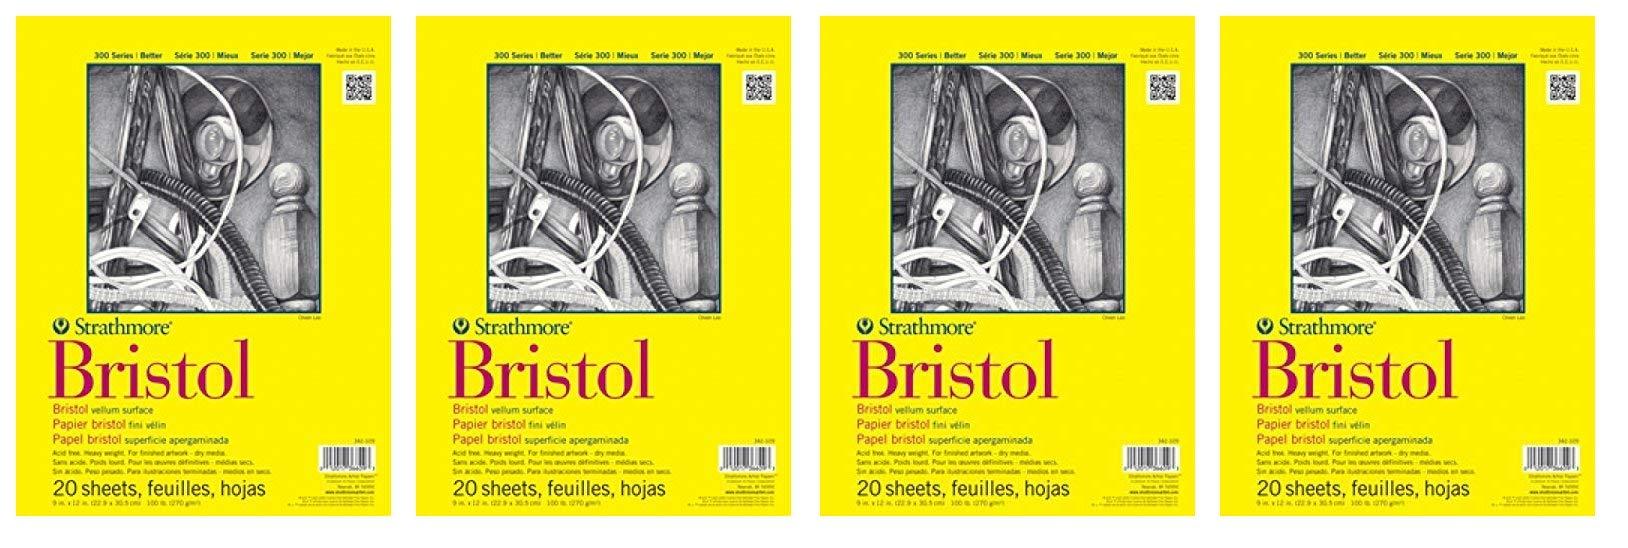 Strathmore (342-119) STR-342-119 20 Sheet Regular Bristol Pad, 19 by 24'', 19''x24'', (Fоur Paсk) by Strathmore